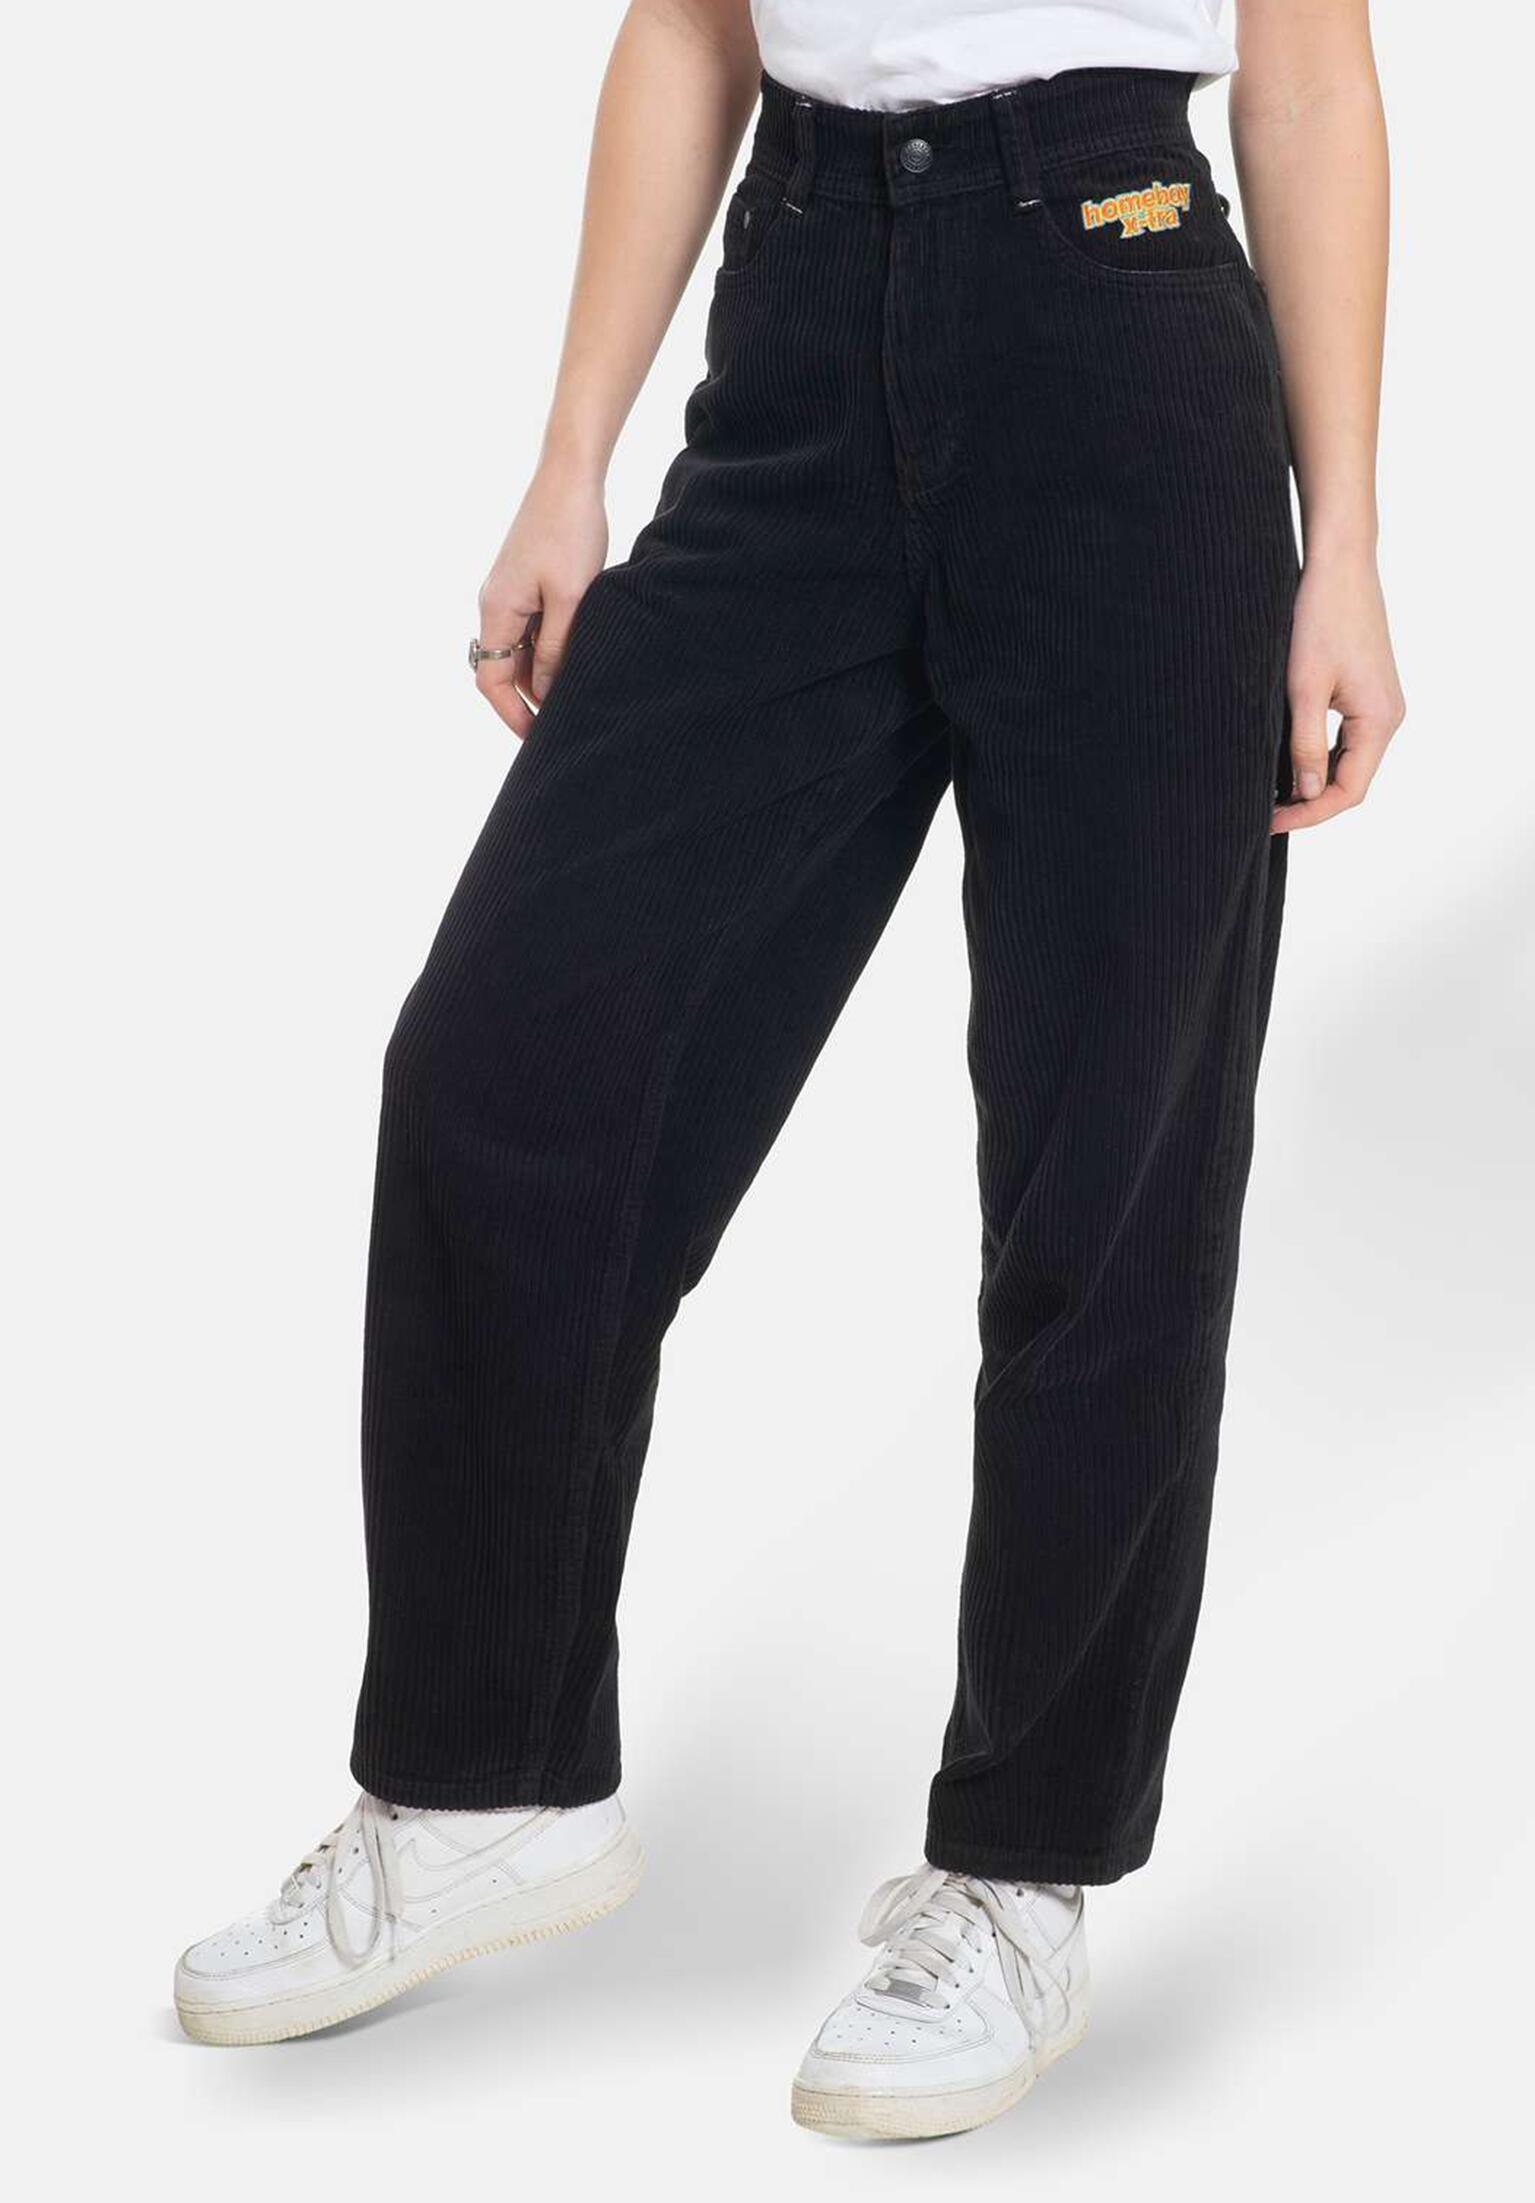 Get Corduraoy pants for Women in the Titus Onlineshop | Titus